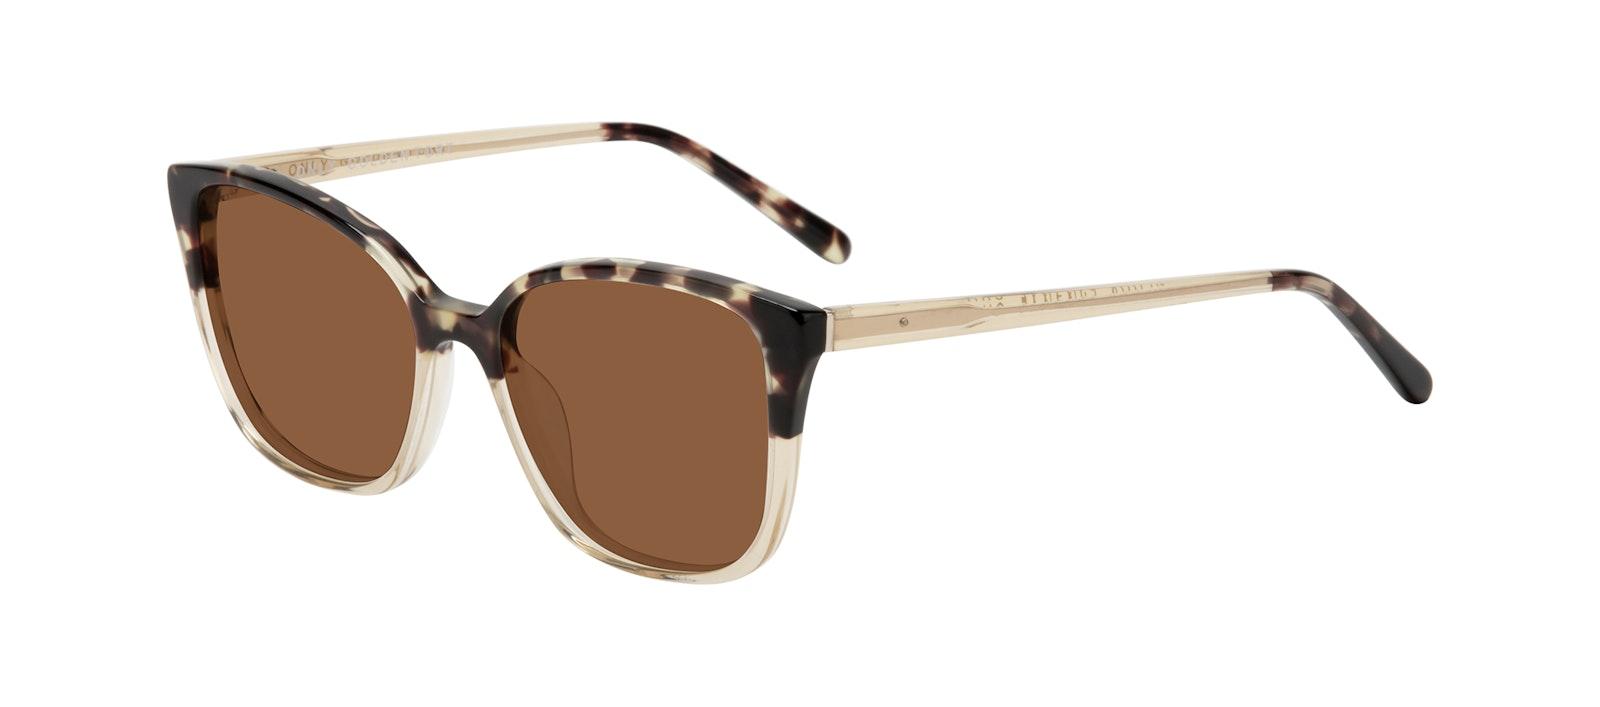 Affordable Fashion Glasses Square Sunglasses Women Only Golden Tort Tilt